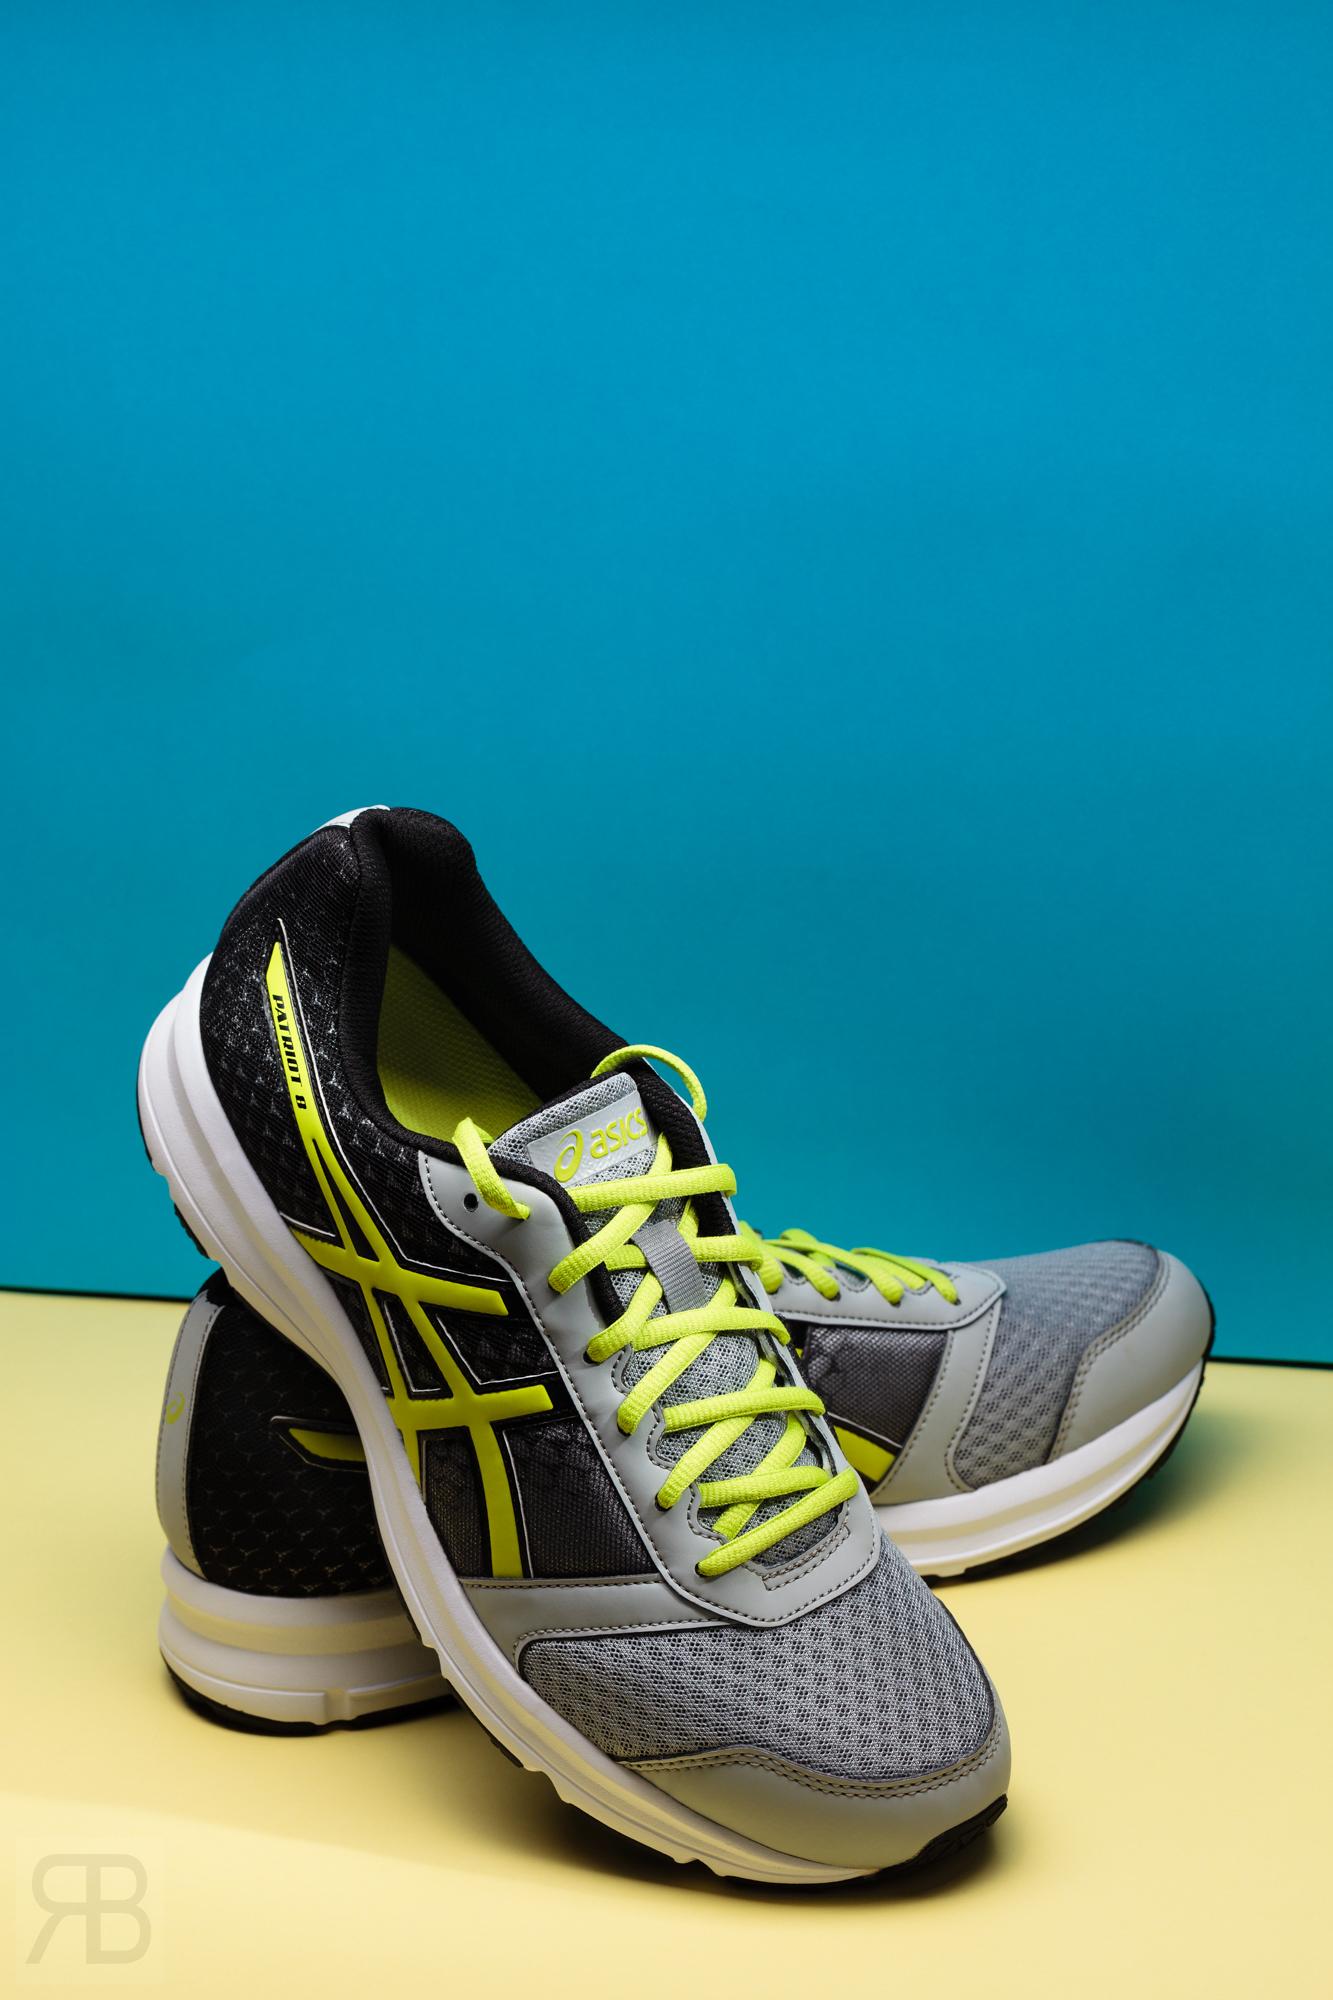 Asics Patriot 8 - Men's Running Shoes